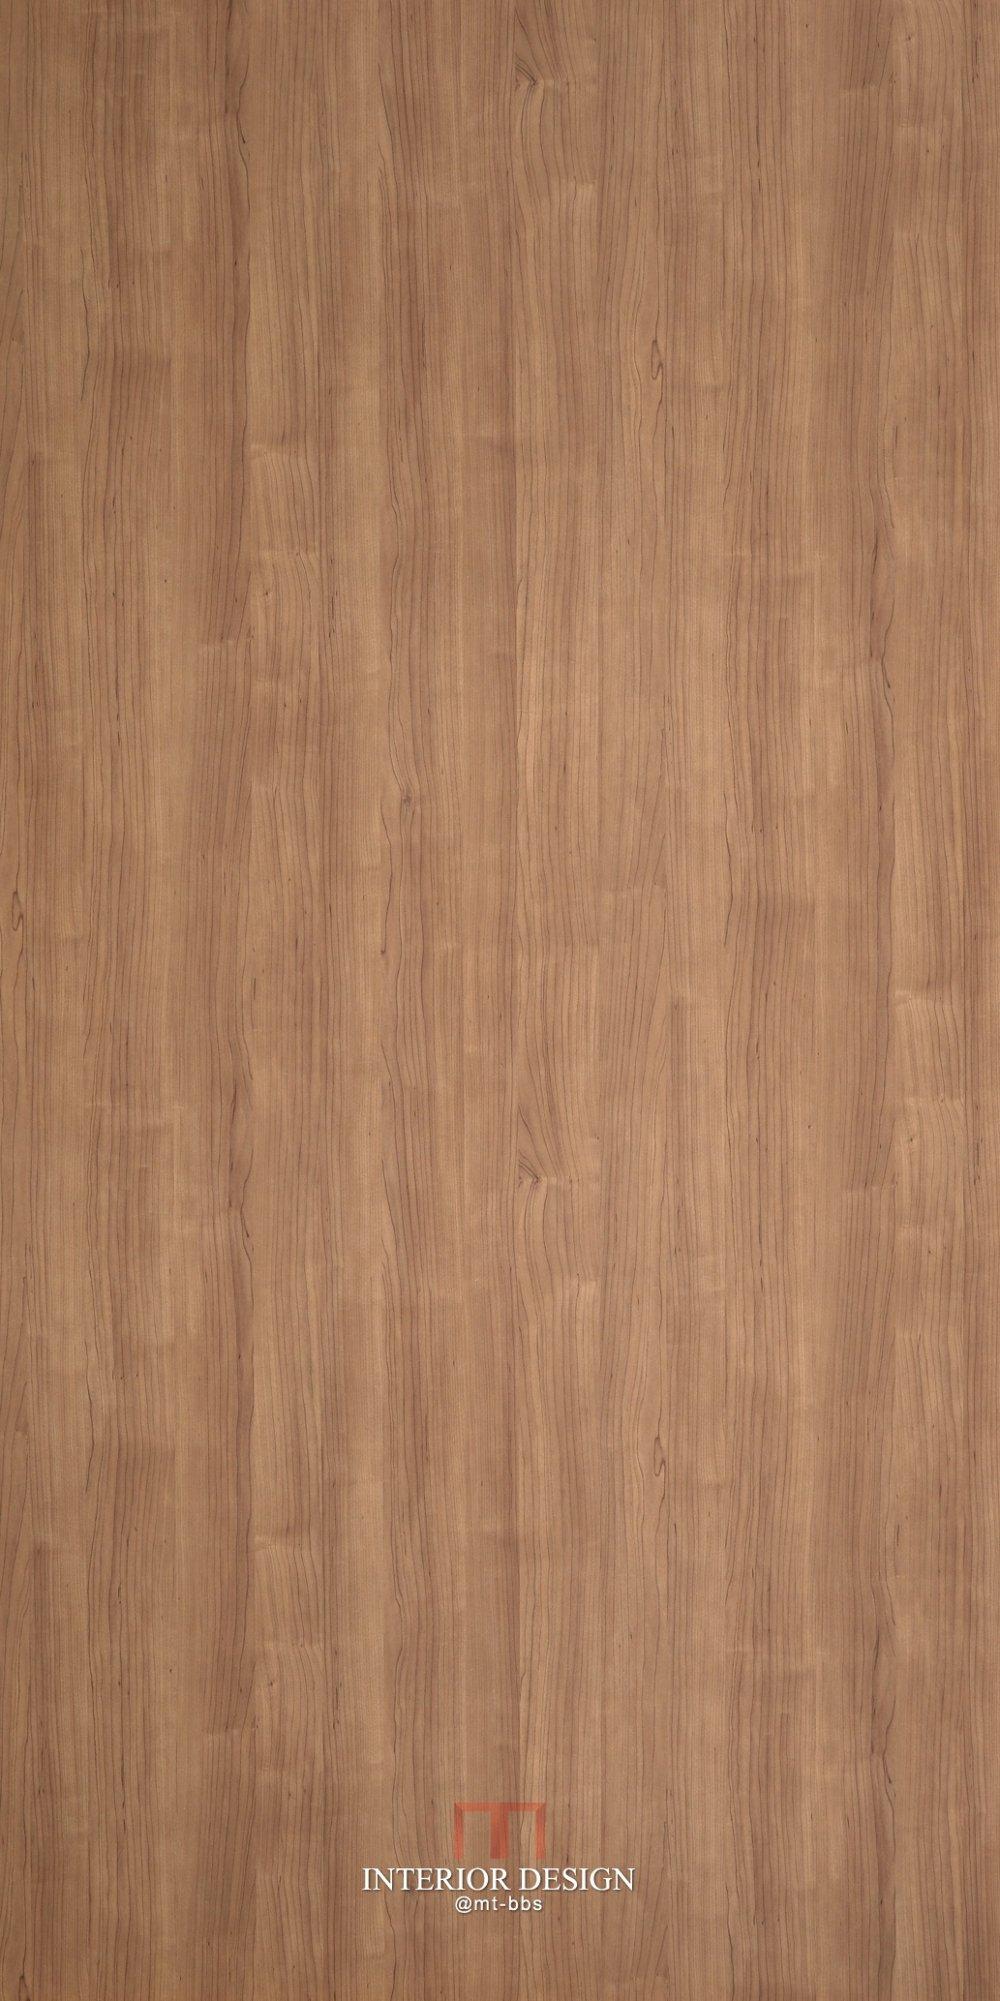 5485 - Spice Maple (in 4\\\' x 8\\\').jpg